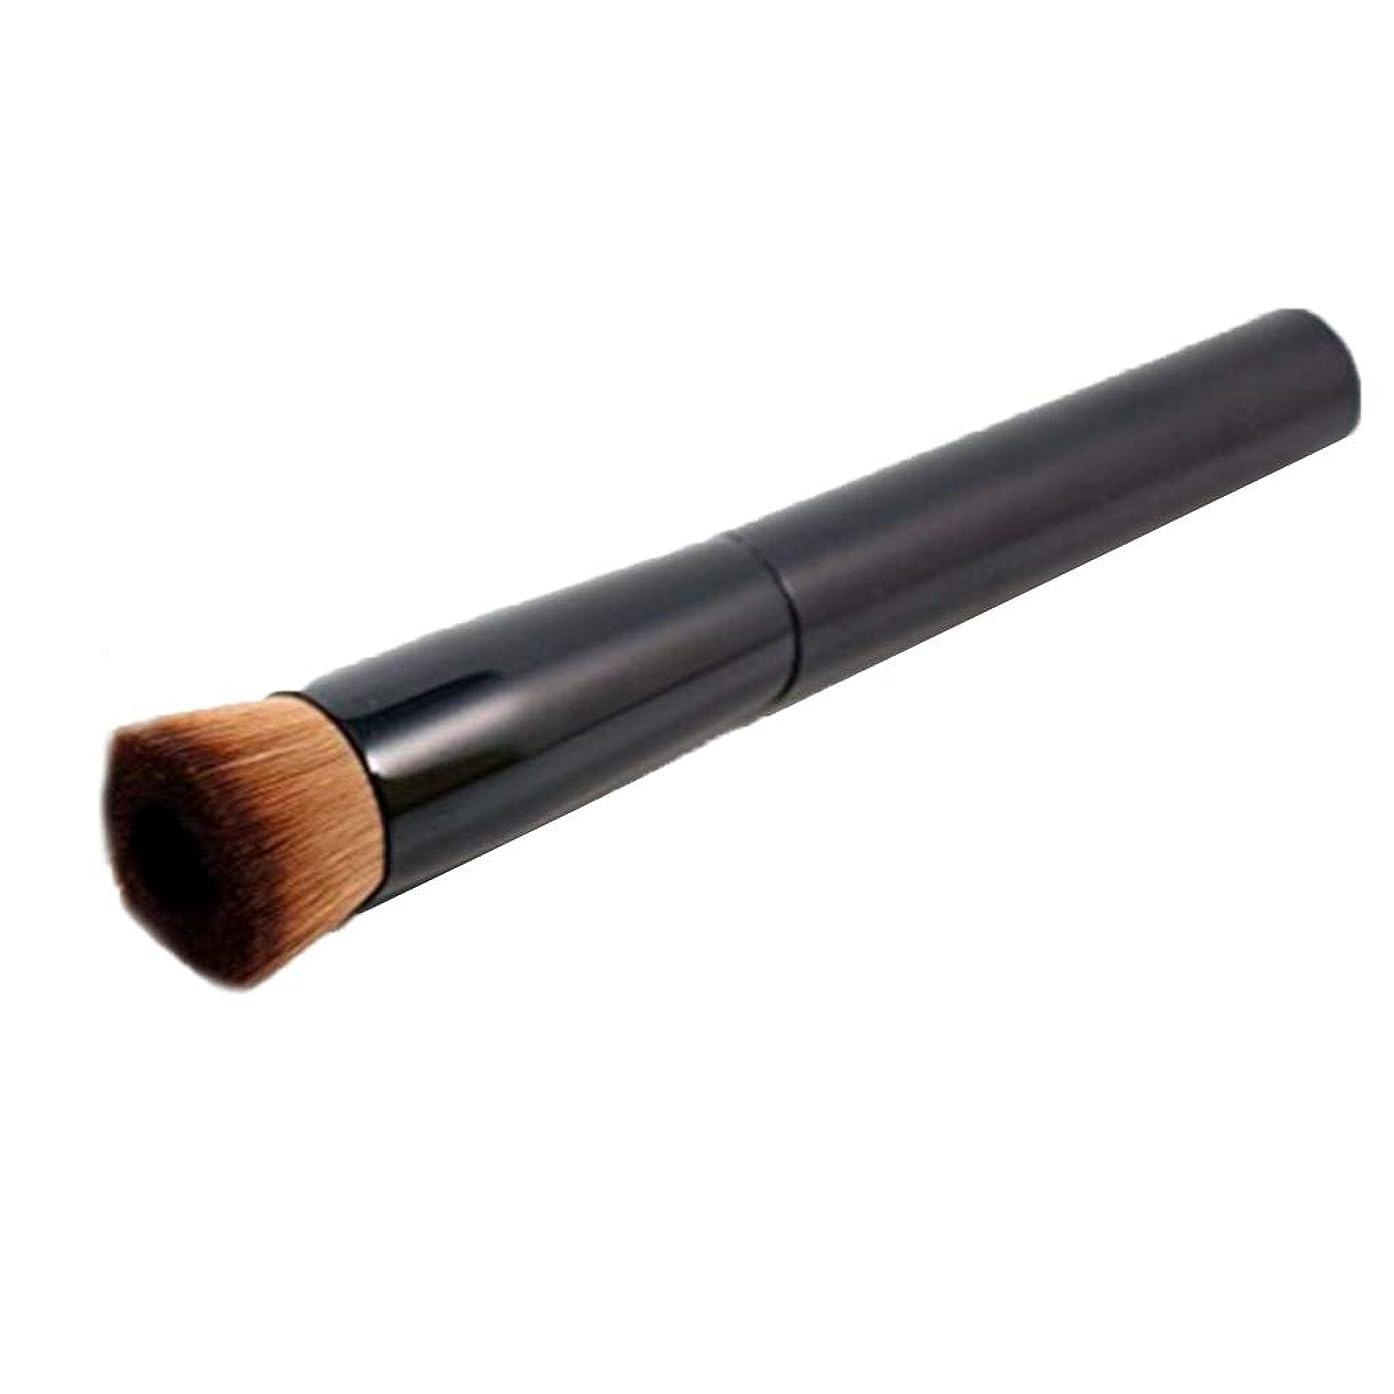 JIAIIO 1PC New Women Professional Face Liquid Foundation Makeup Brush Women Girls Powder Brush